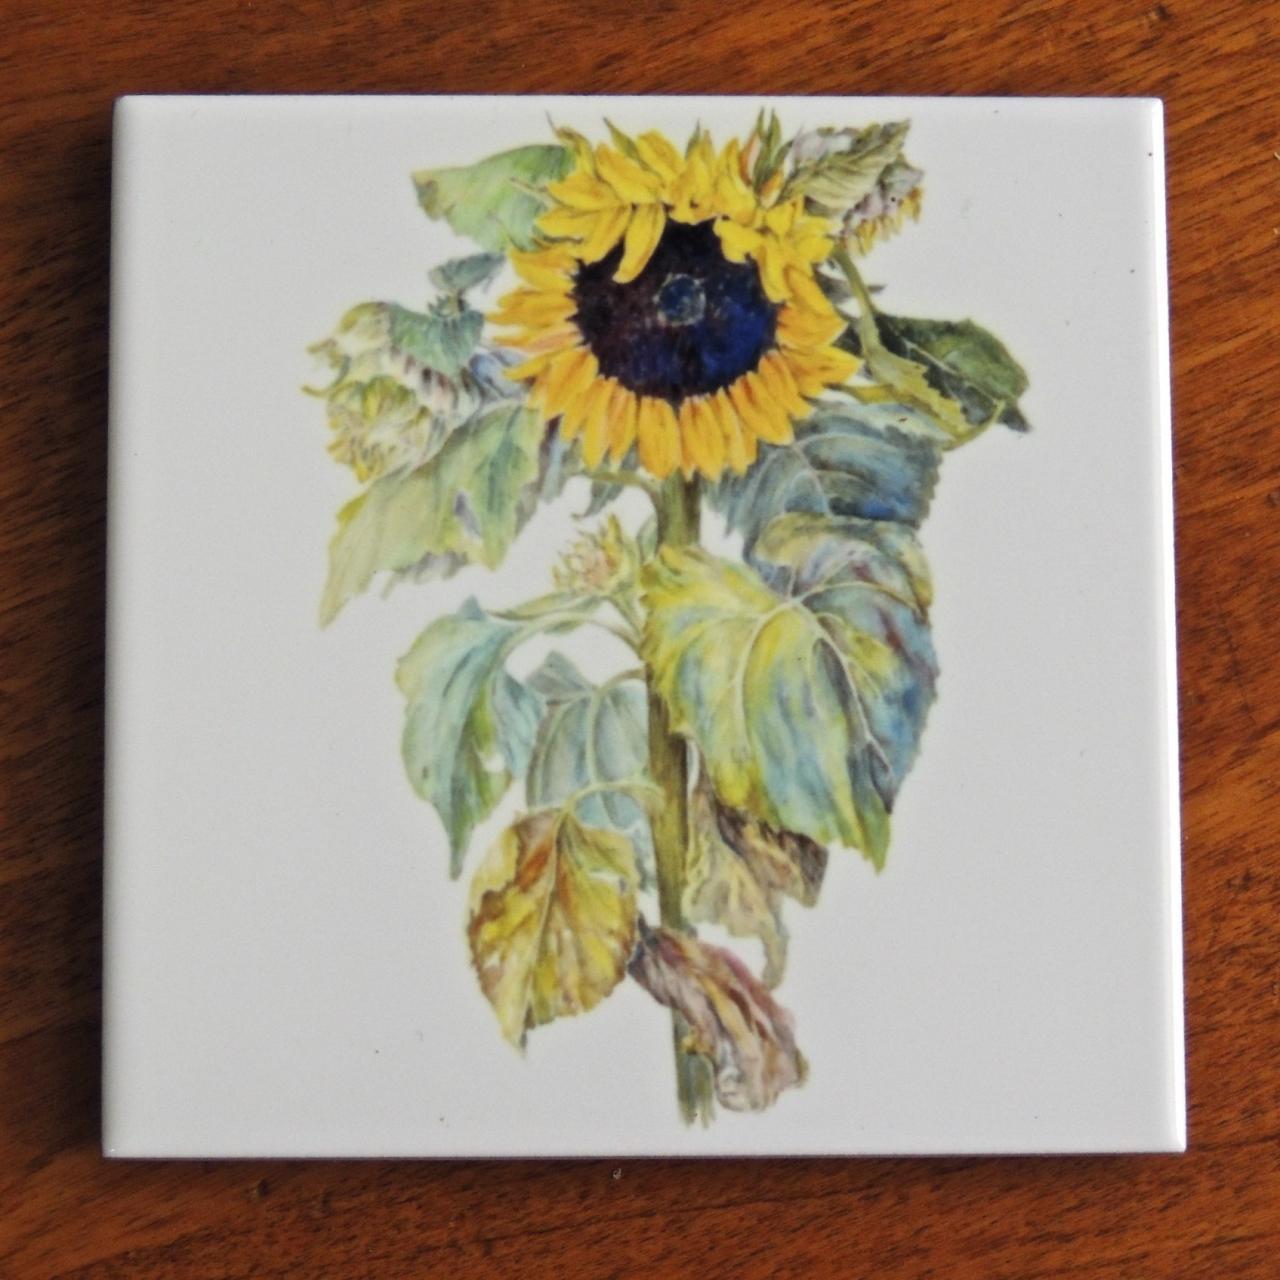 Country garden watercolors decorative ceramic tiles ceramic tiles 718 sunflower tile dailygadgetfo Choice Image